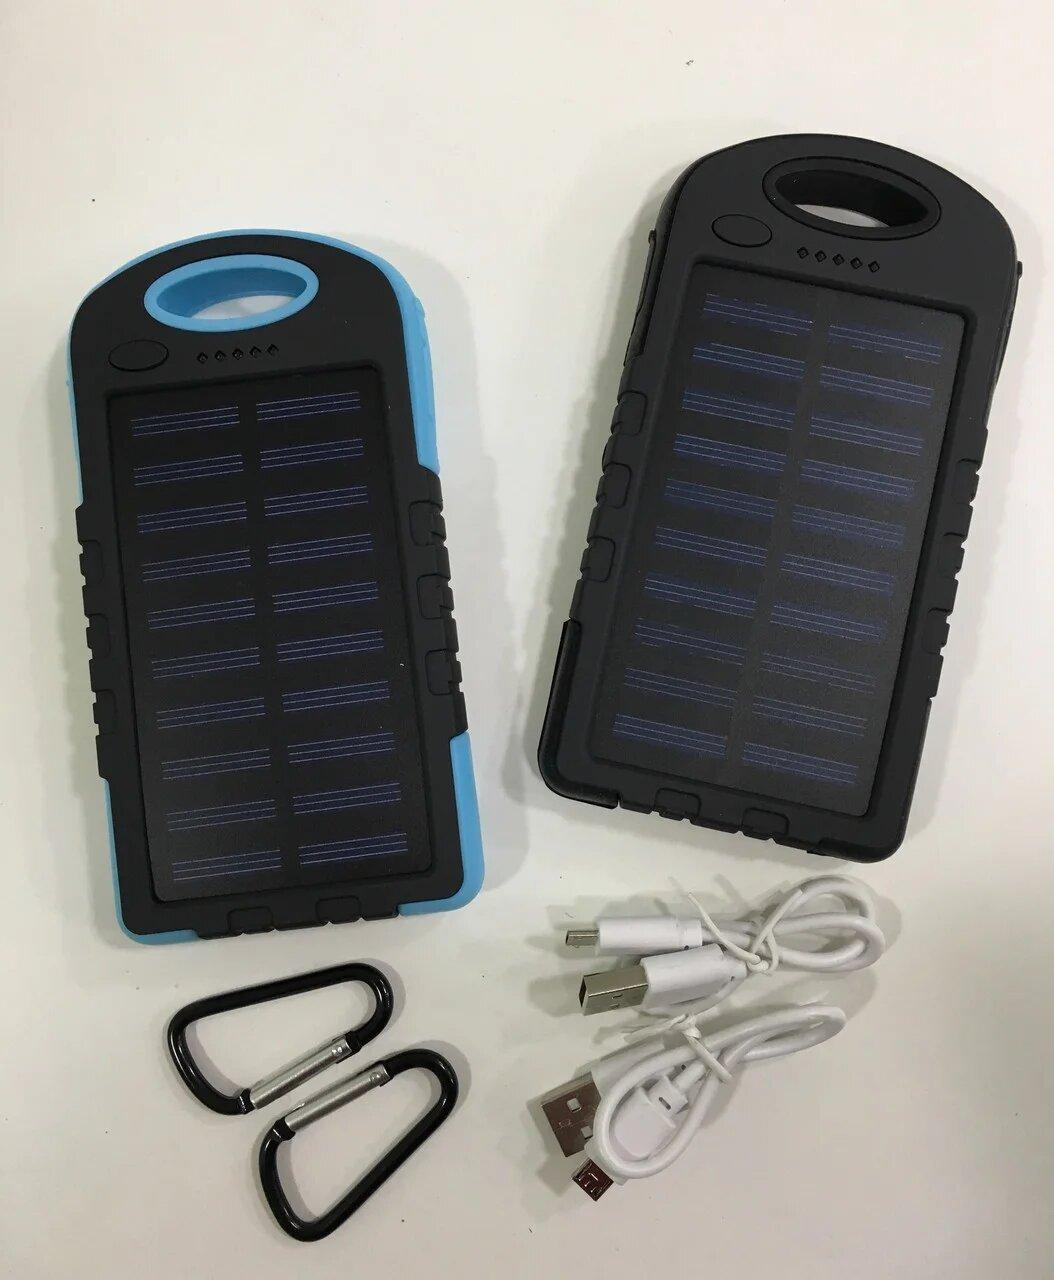 Солнечная батарея Power Bank A50 20800 mAh (Повер банк, мобильная зарядка), фото 2